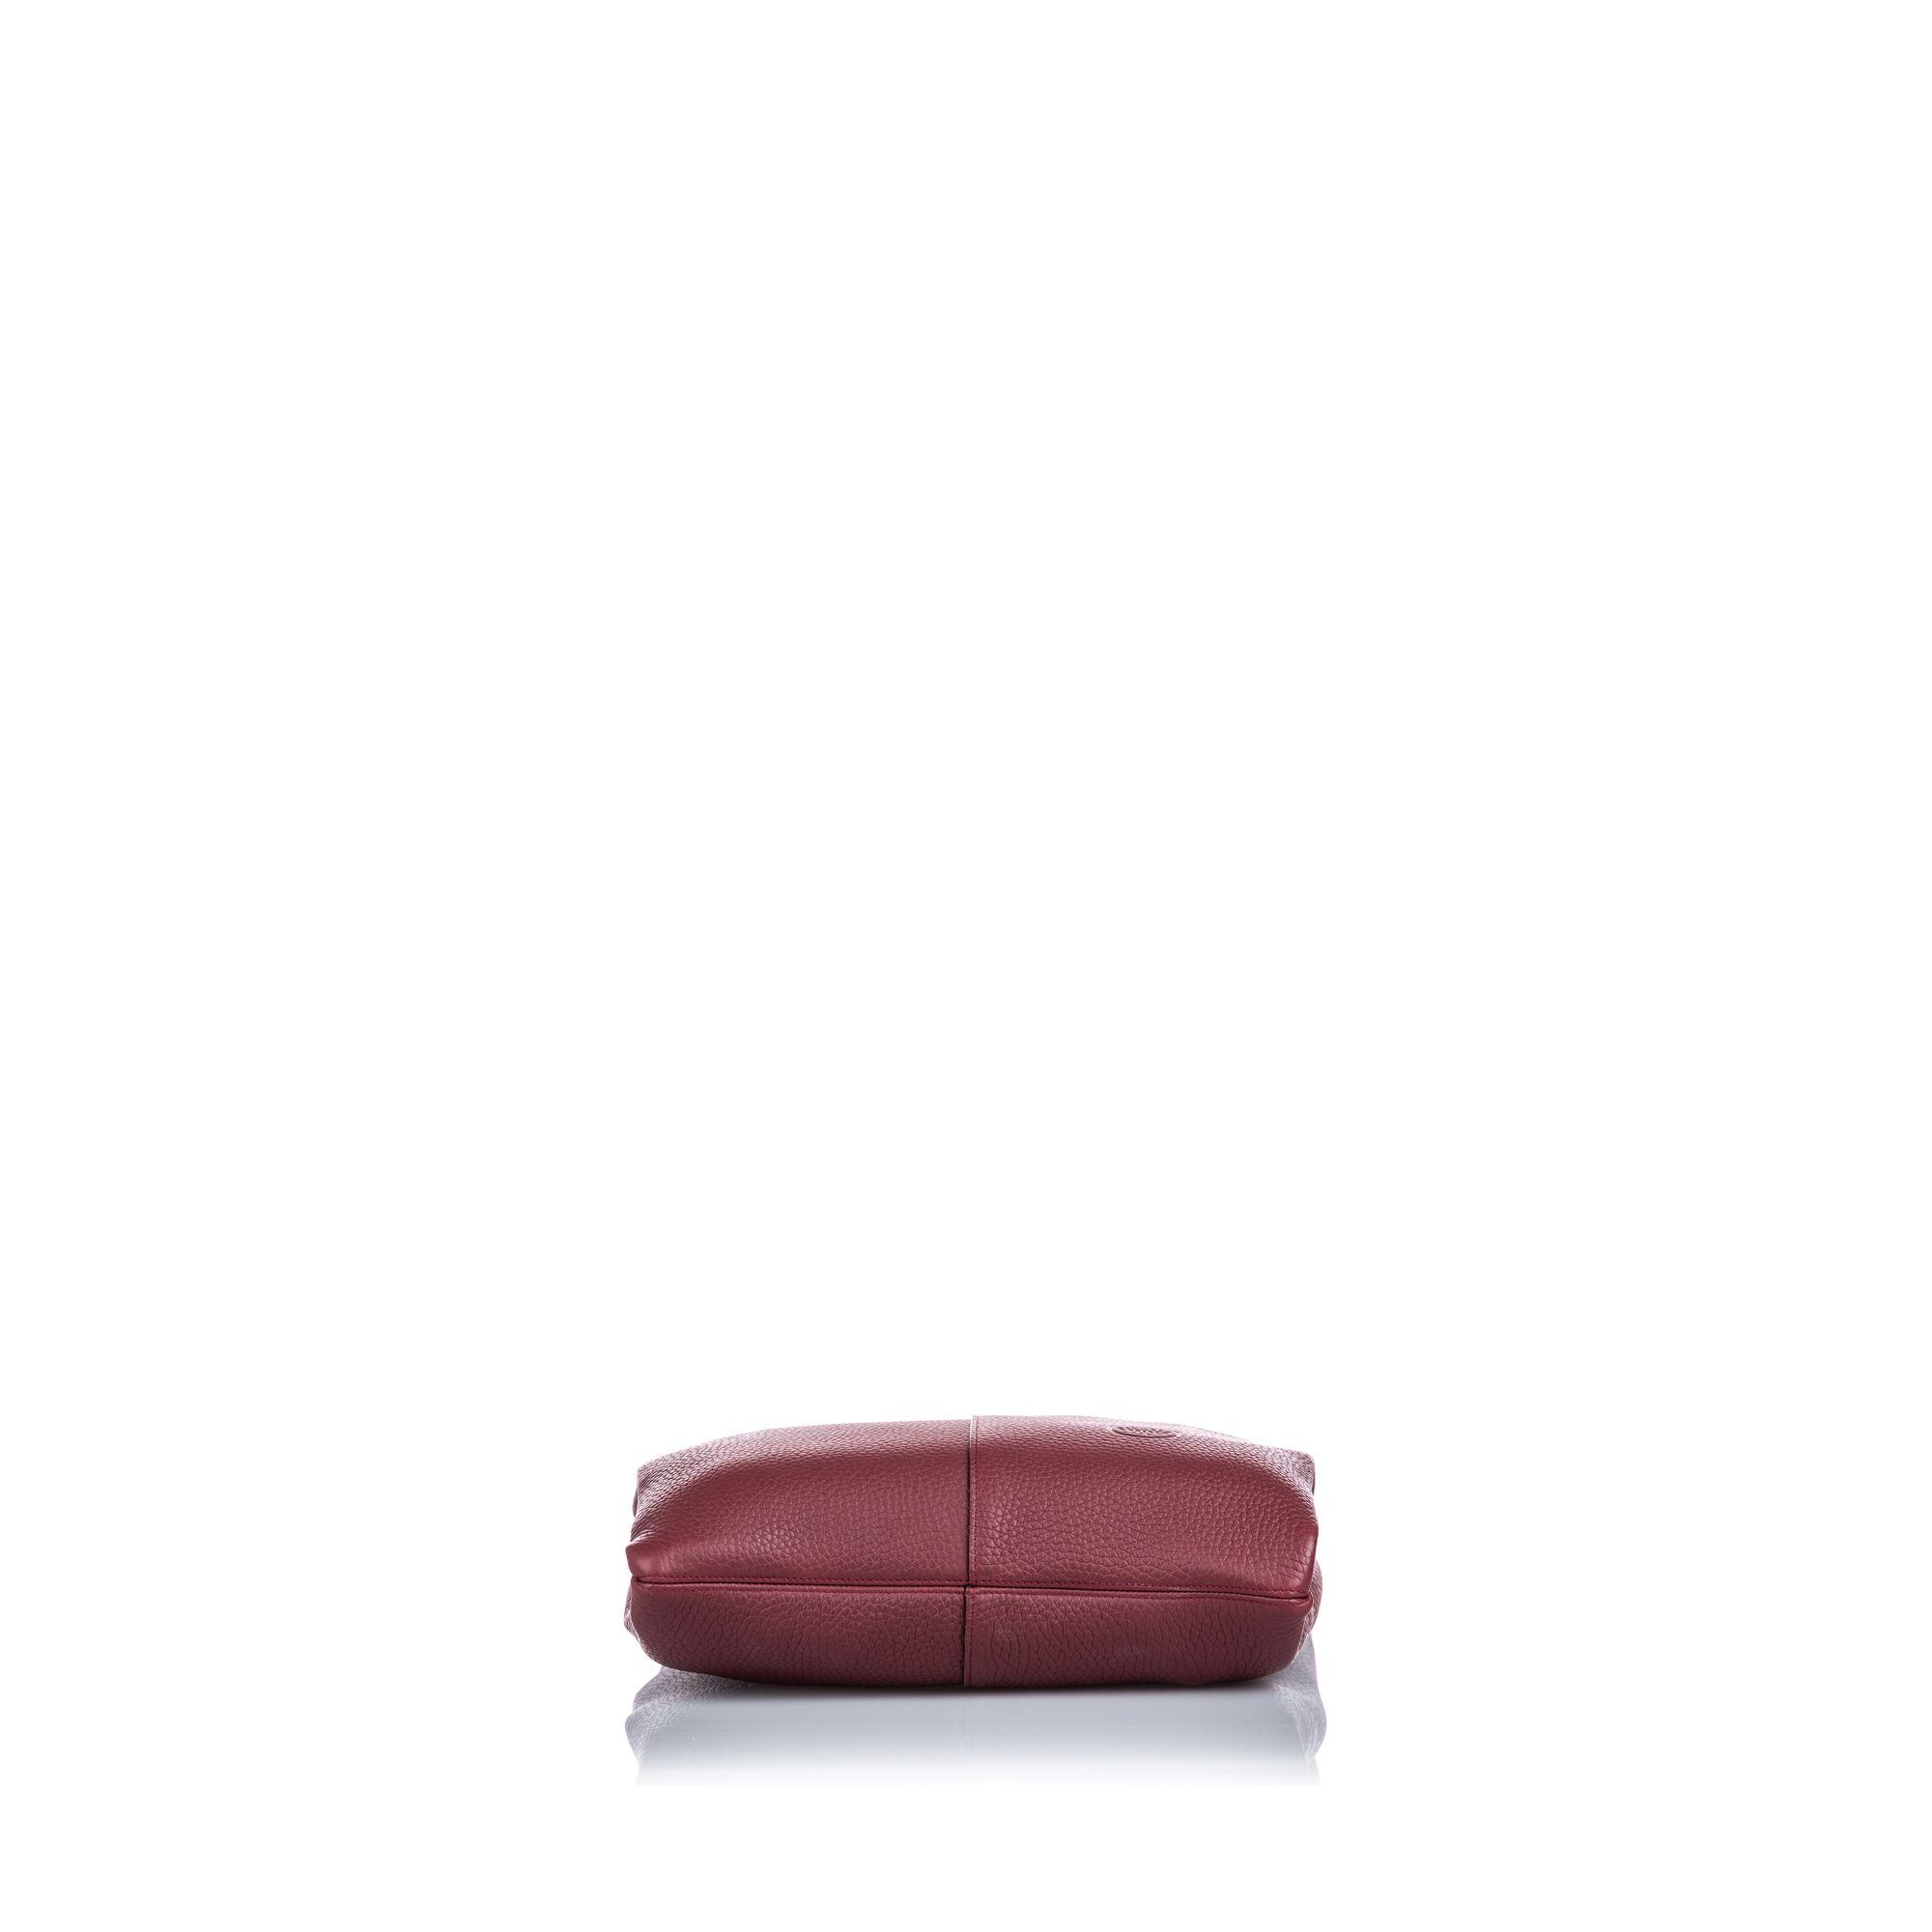 Vintage Mulberry Leather Portobello Tote Red